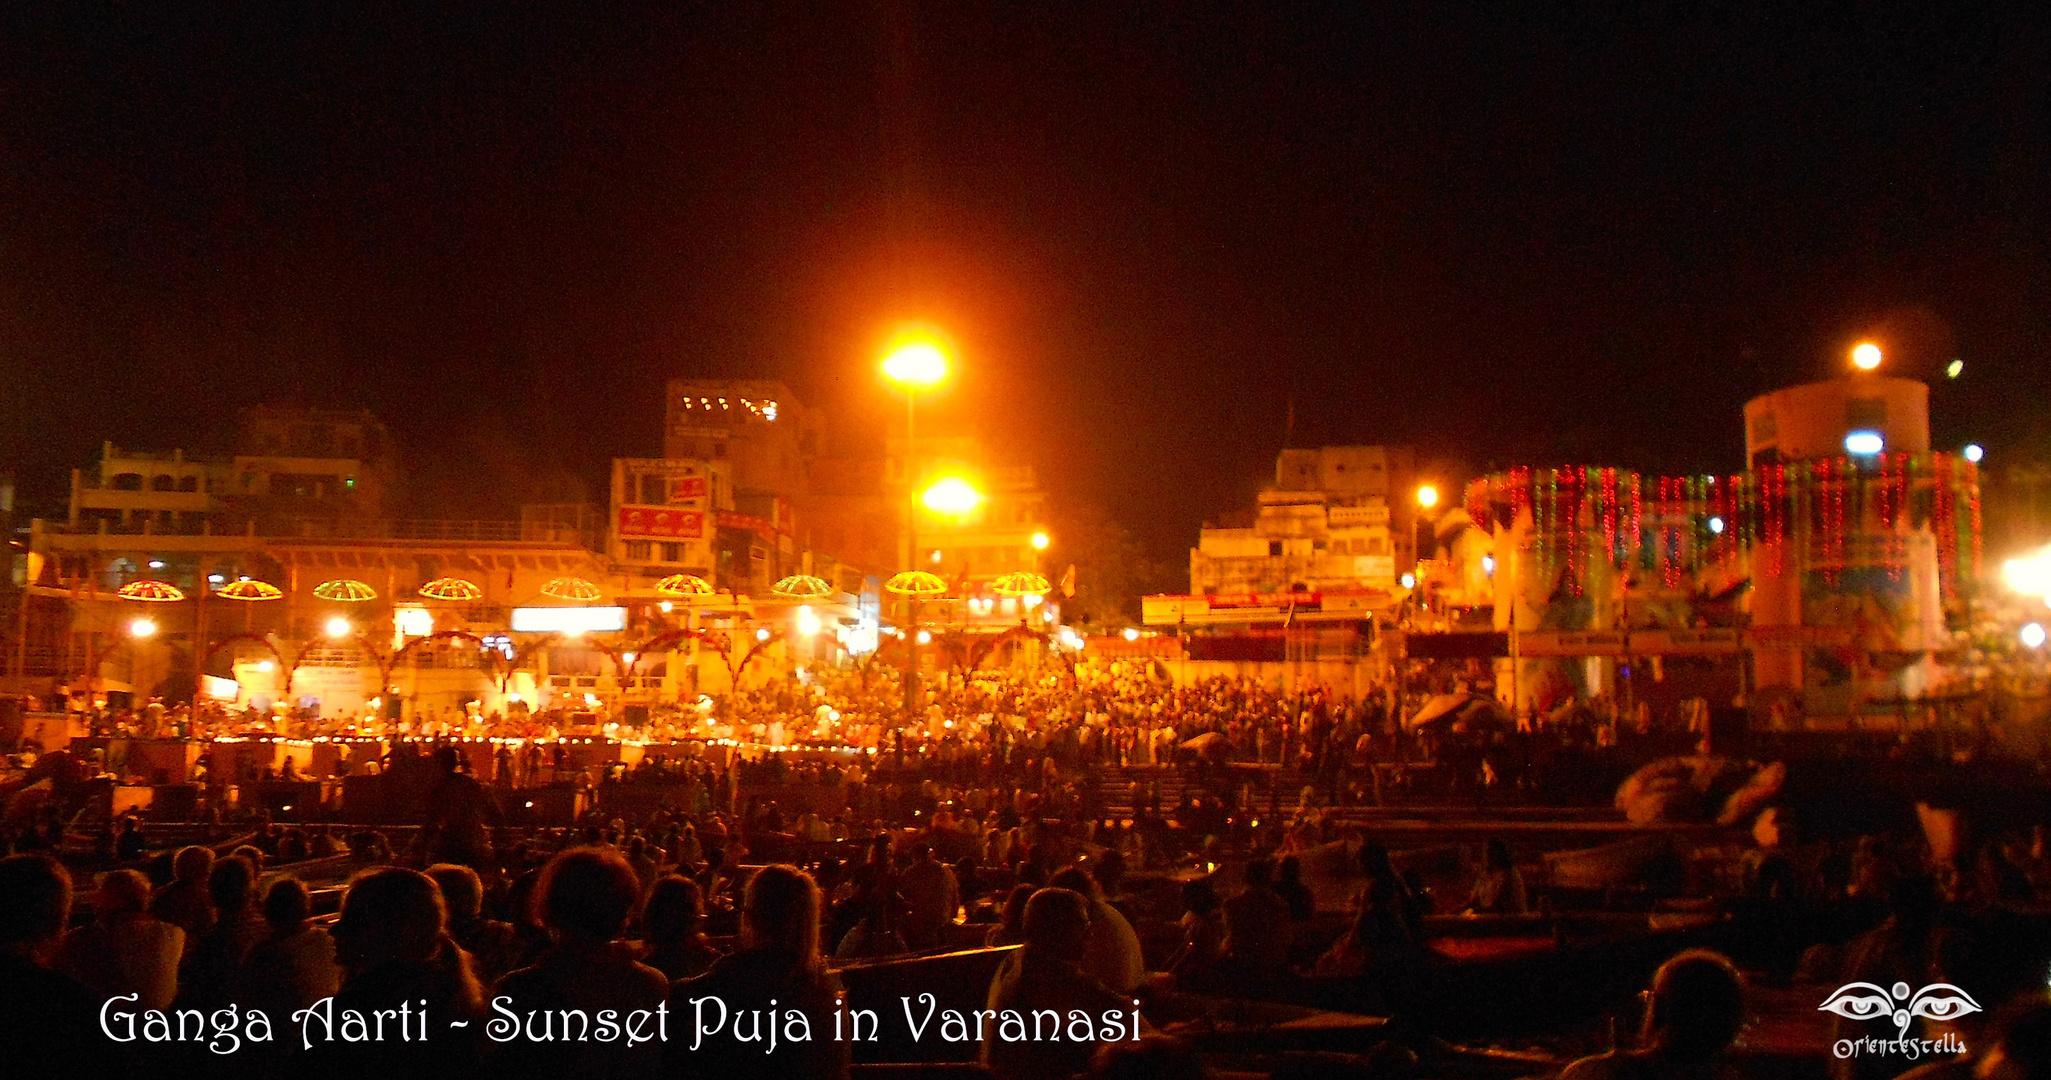 Ganga Aarti - Sunset Puja in Varanasi